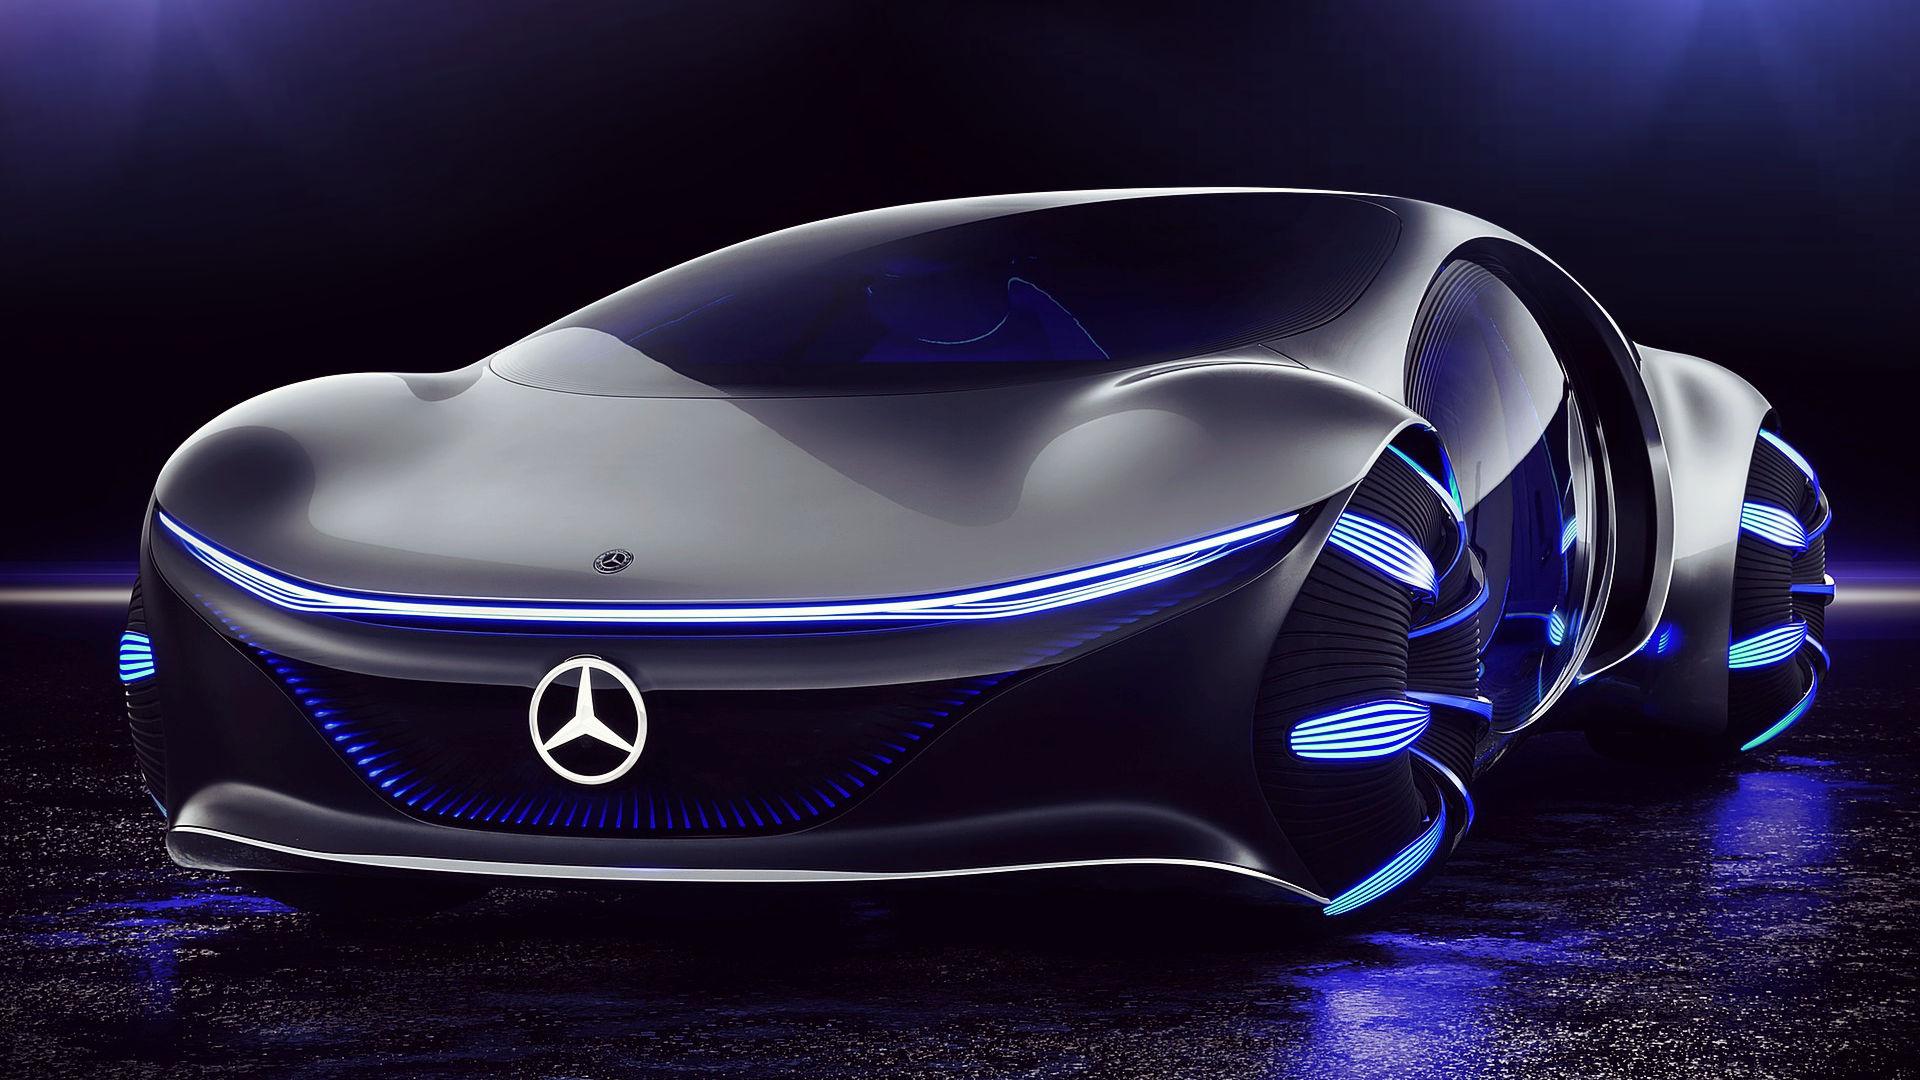 Mercedes Benz Vision Avtr Concept 2020 Wallpaper 1920x1080